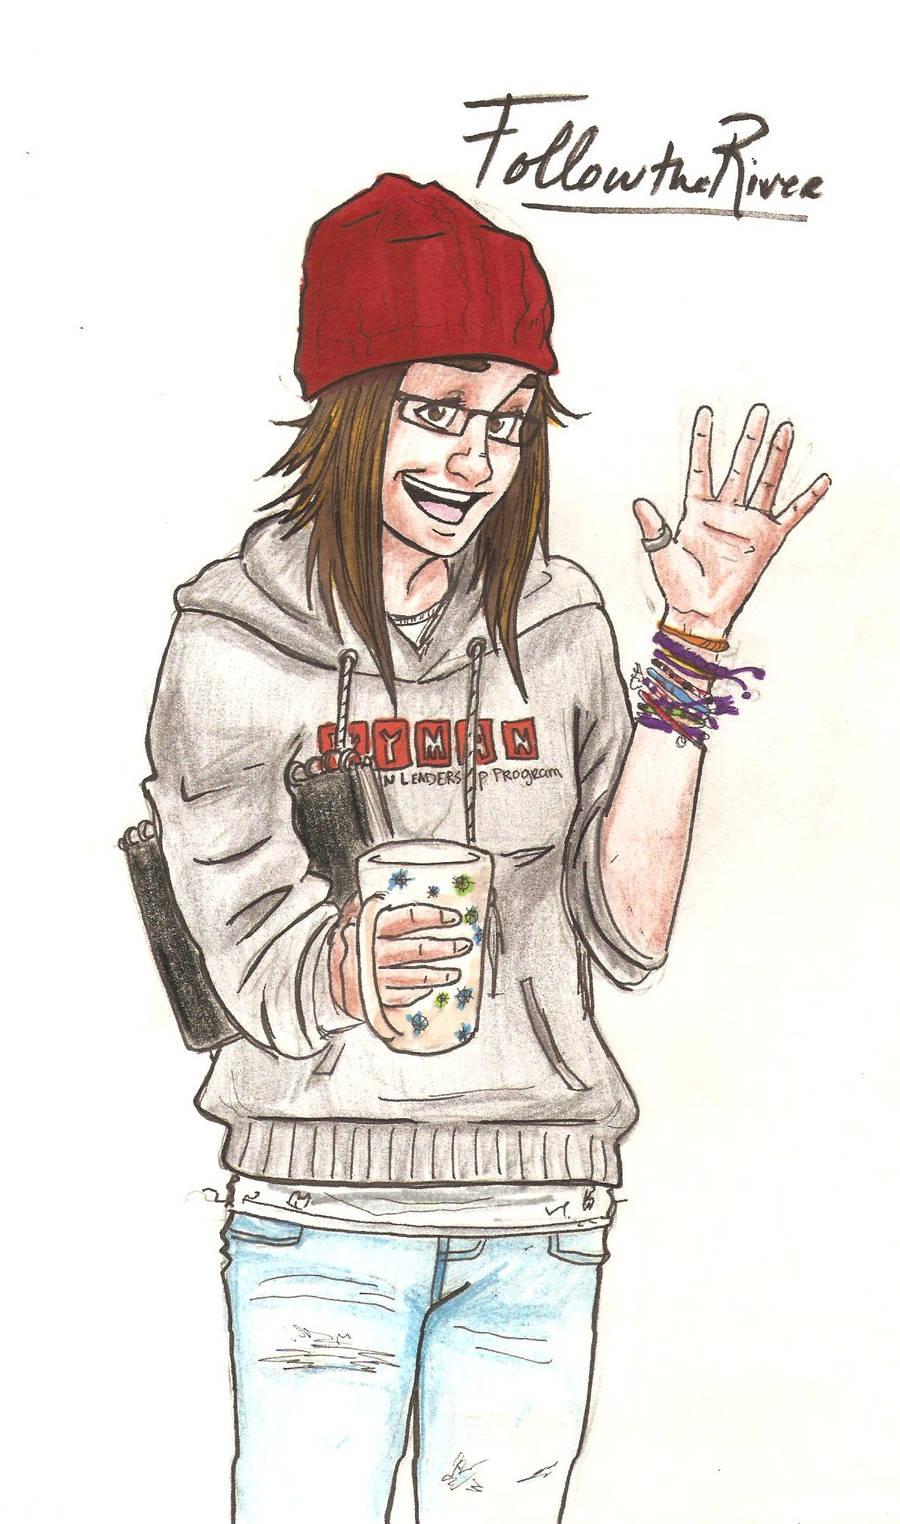 FollowtheRiver's Profile Picture